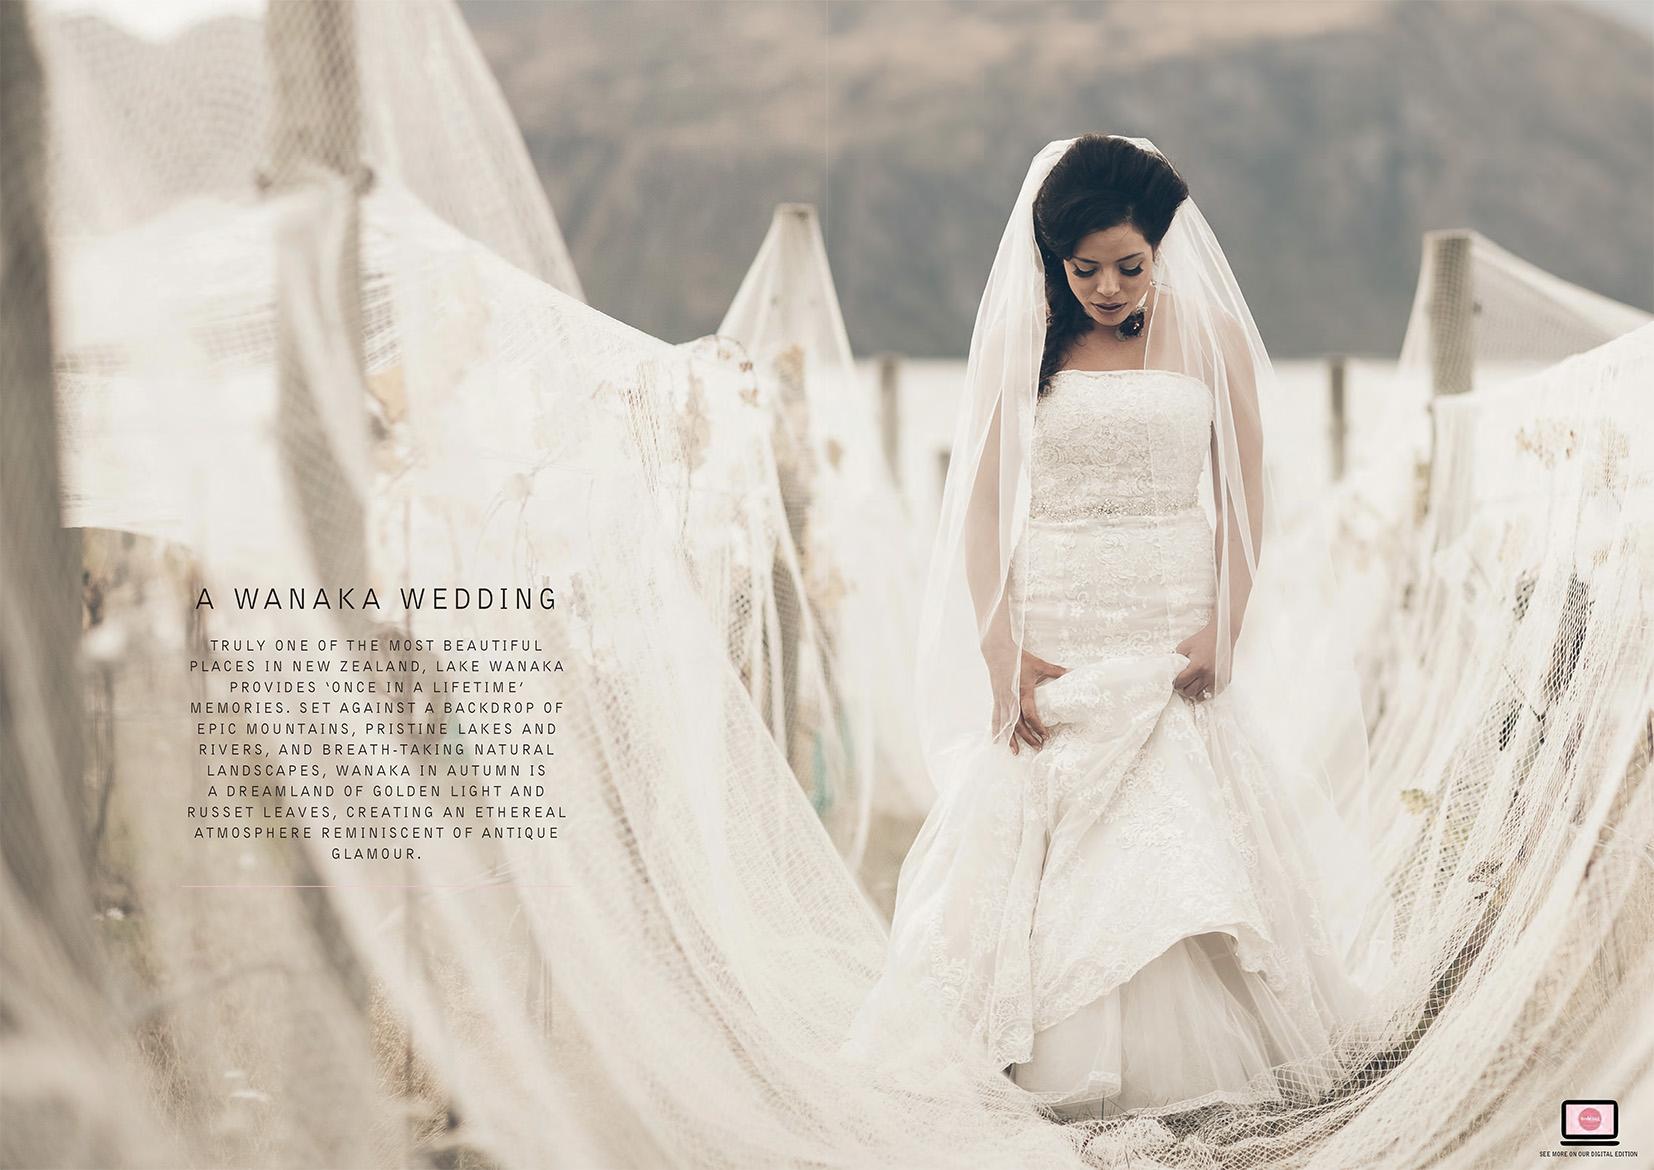 Autumn-wanaka-wedding